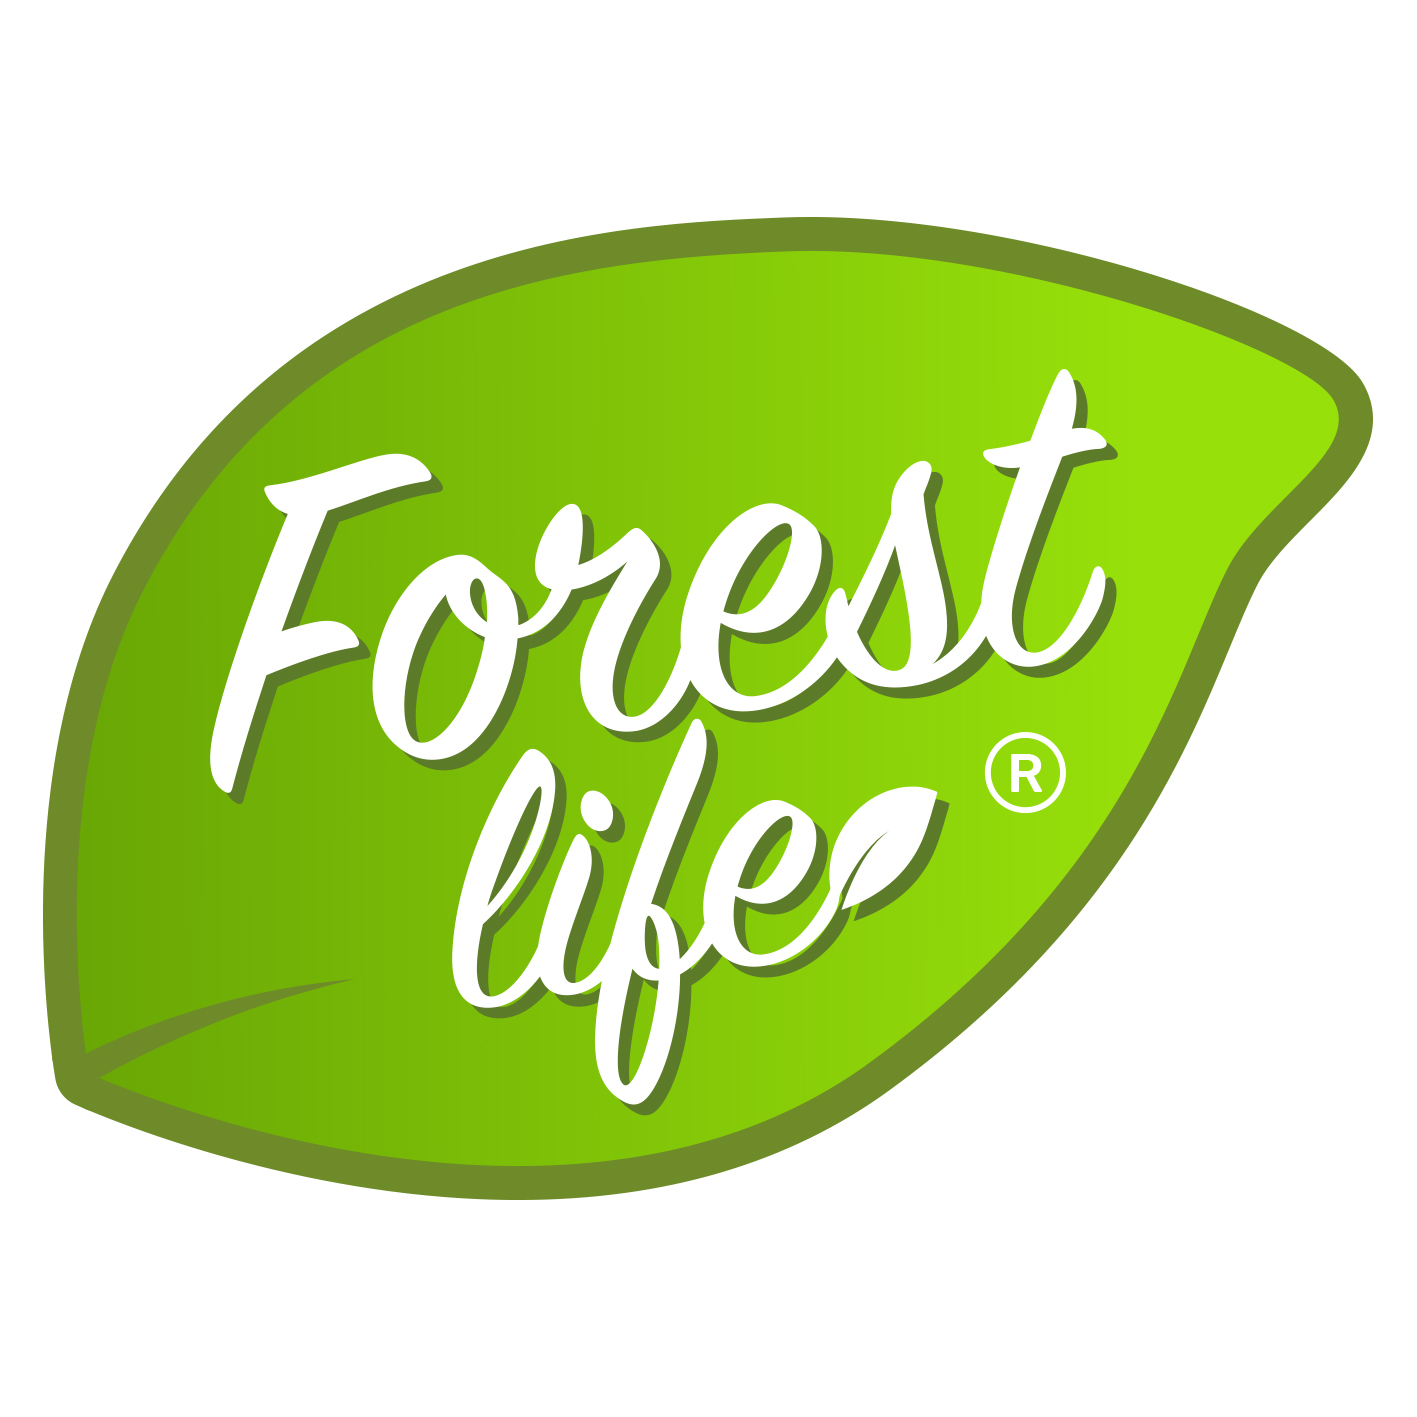 LOGO_FORESTLIFE03b.jpg